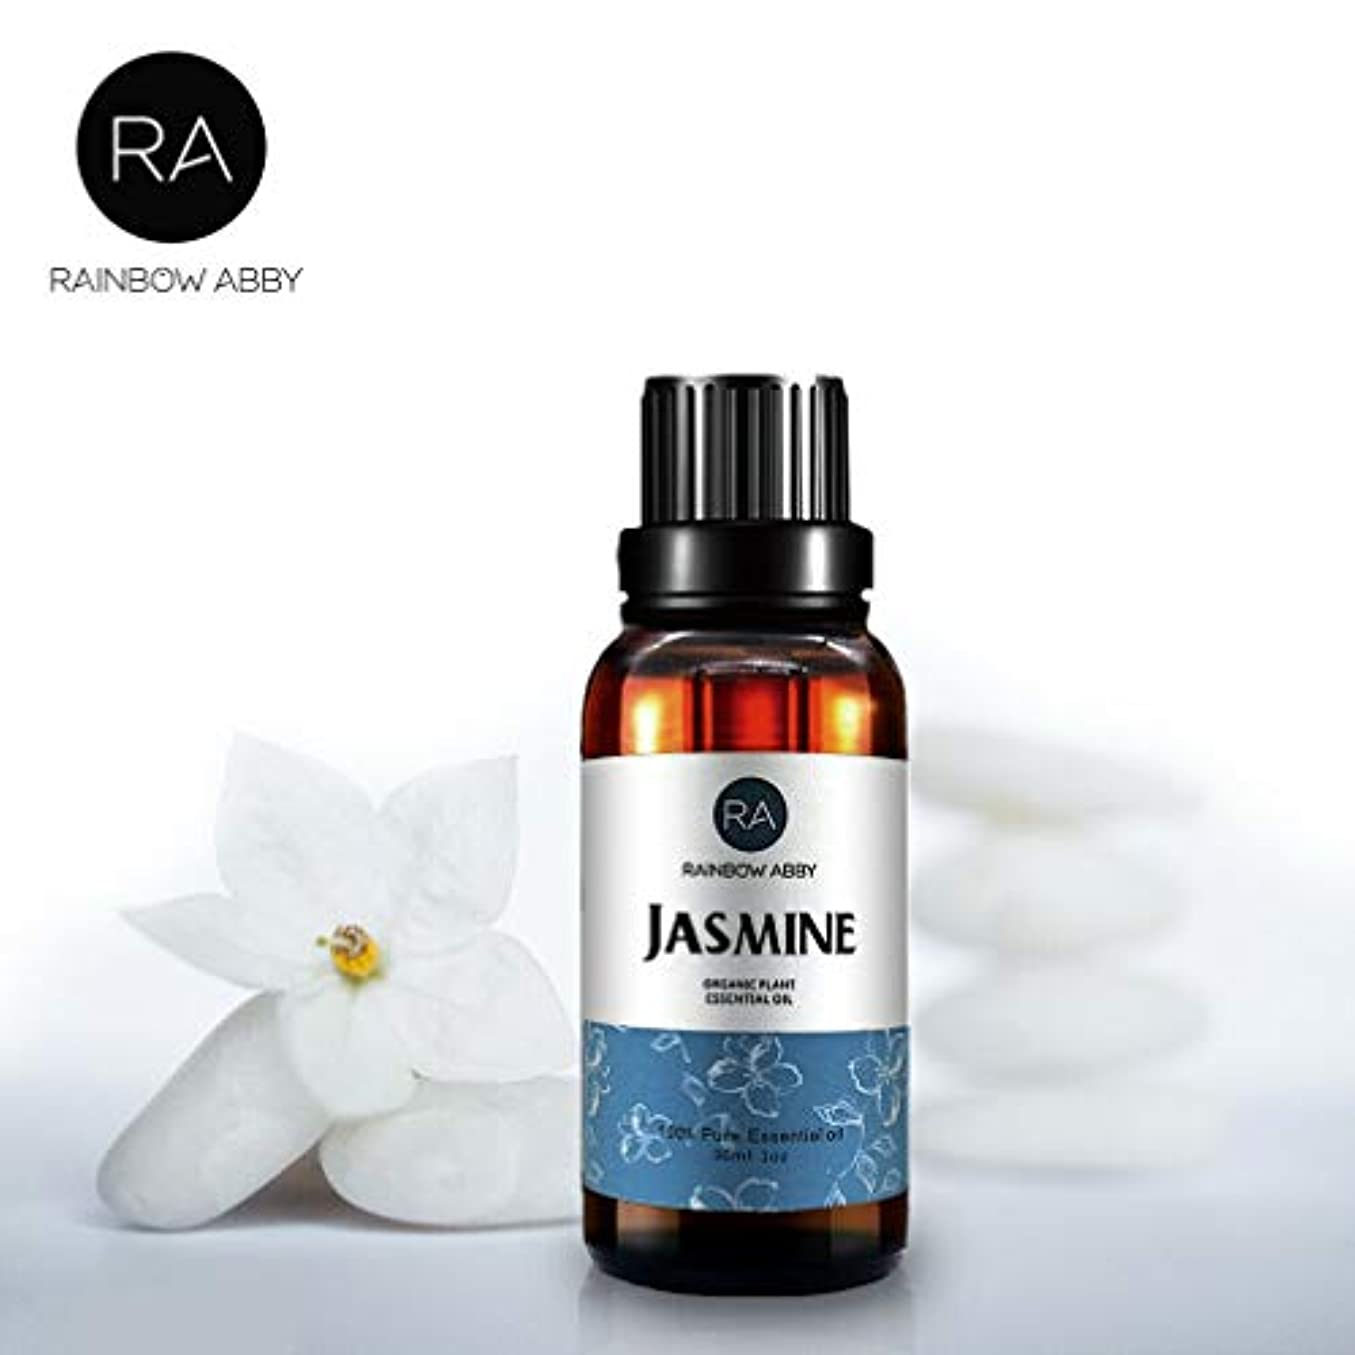 RAINBOW ABBY ジャスミン エッセンシャル オイル ディフューザー アロマ セラピー オイル (30ML/1oz) 100% ピュアオーガニック 植物 エキス オイル